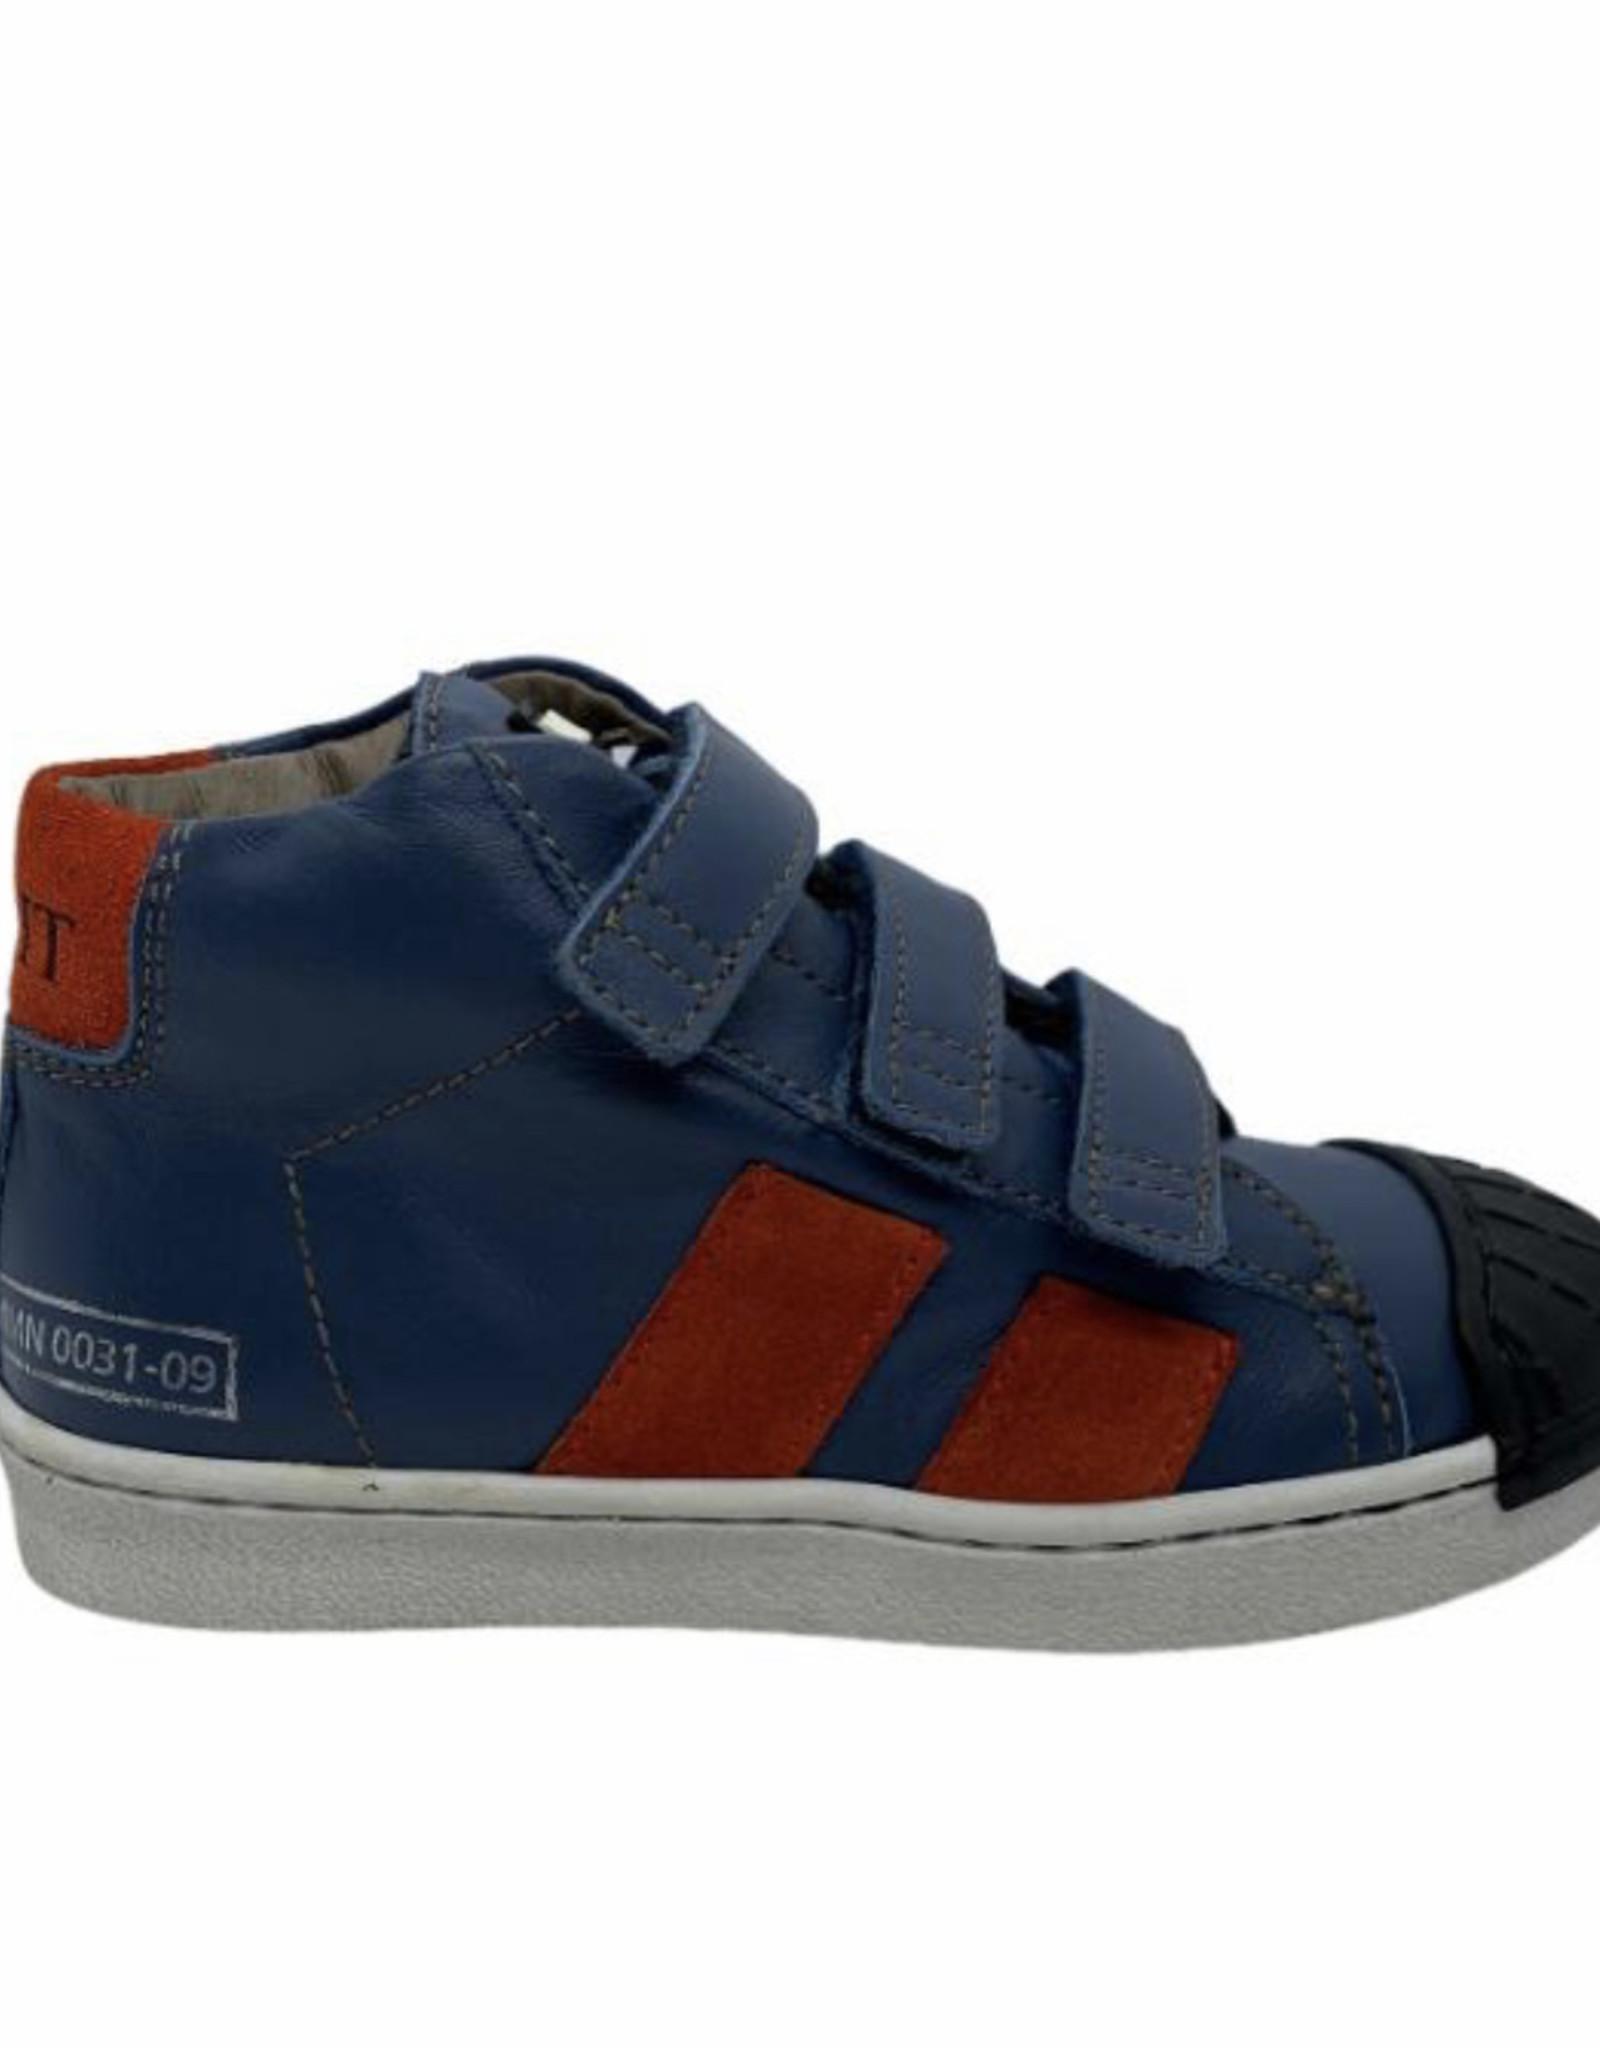 Momino 3136 hoge sneaker velcro blauw rood